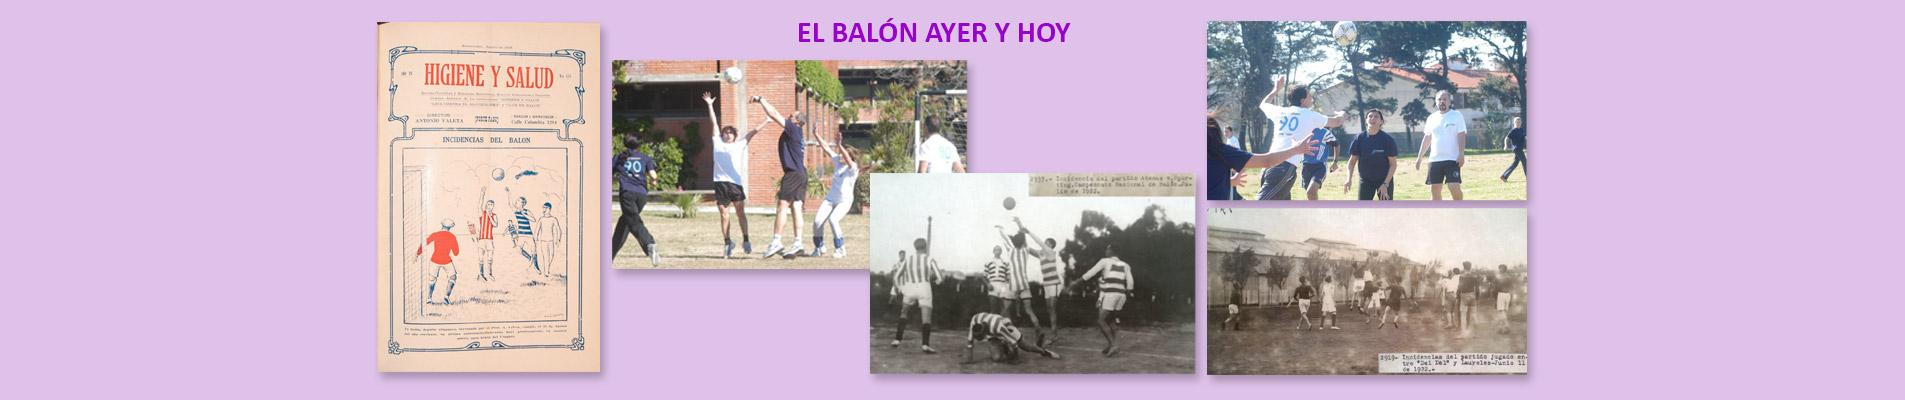 balonmano-banner-1920-2